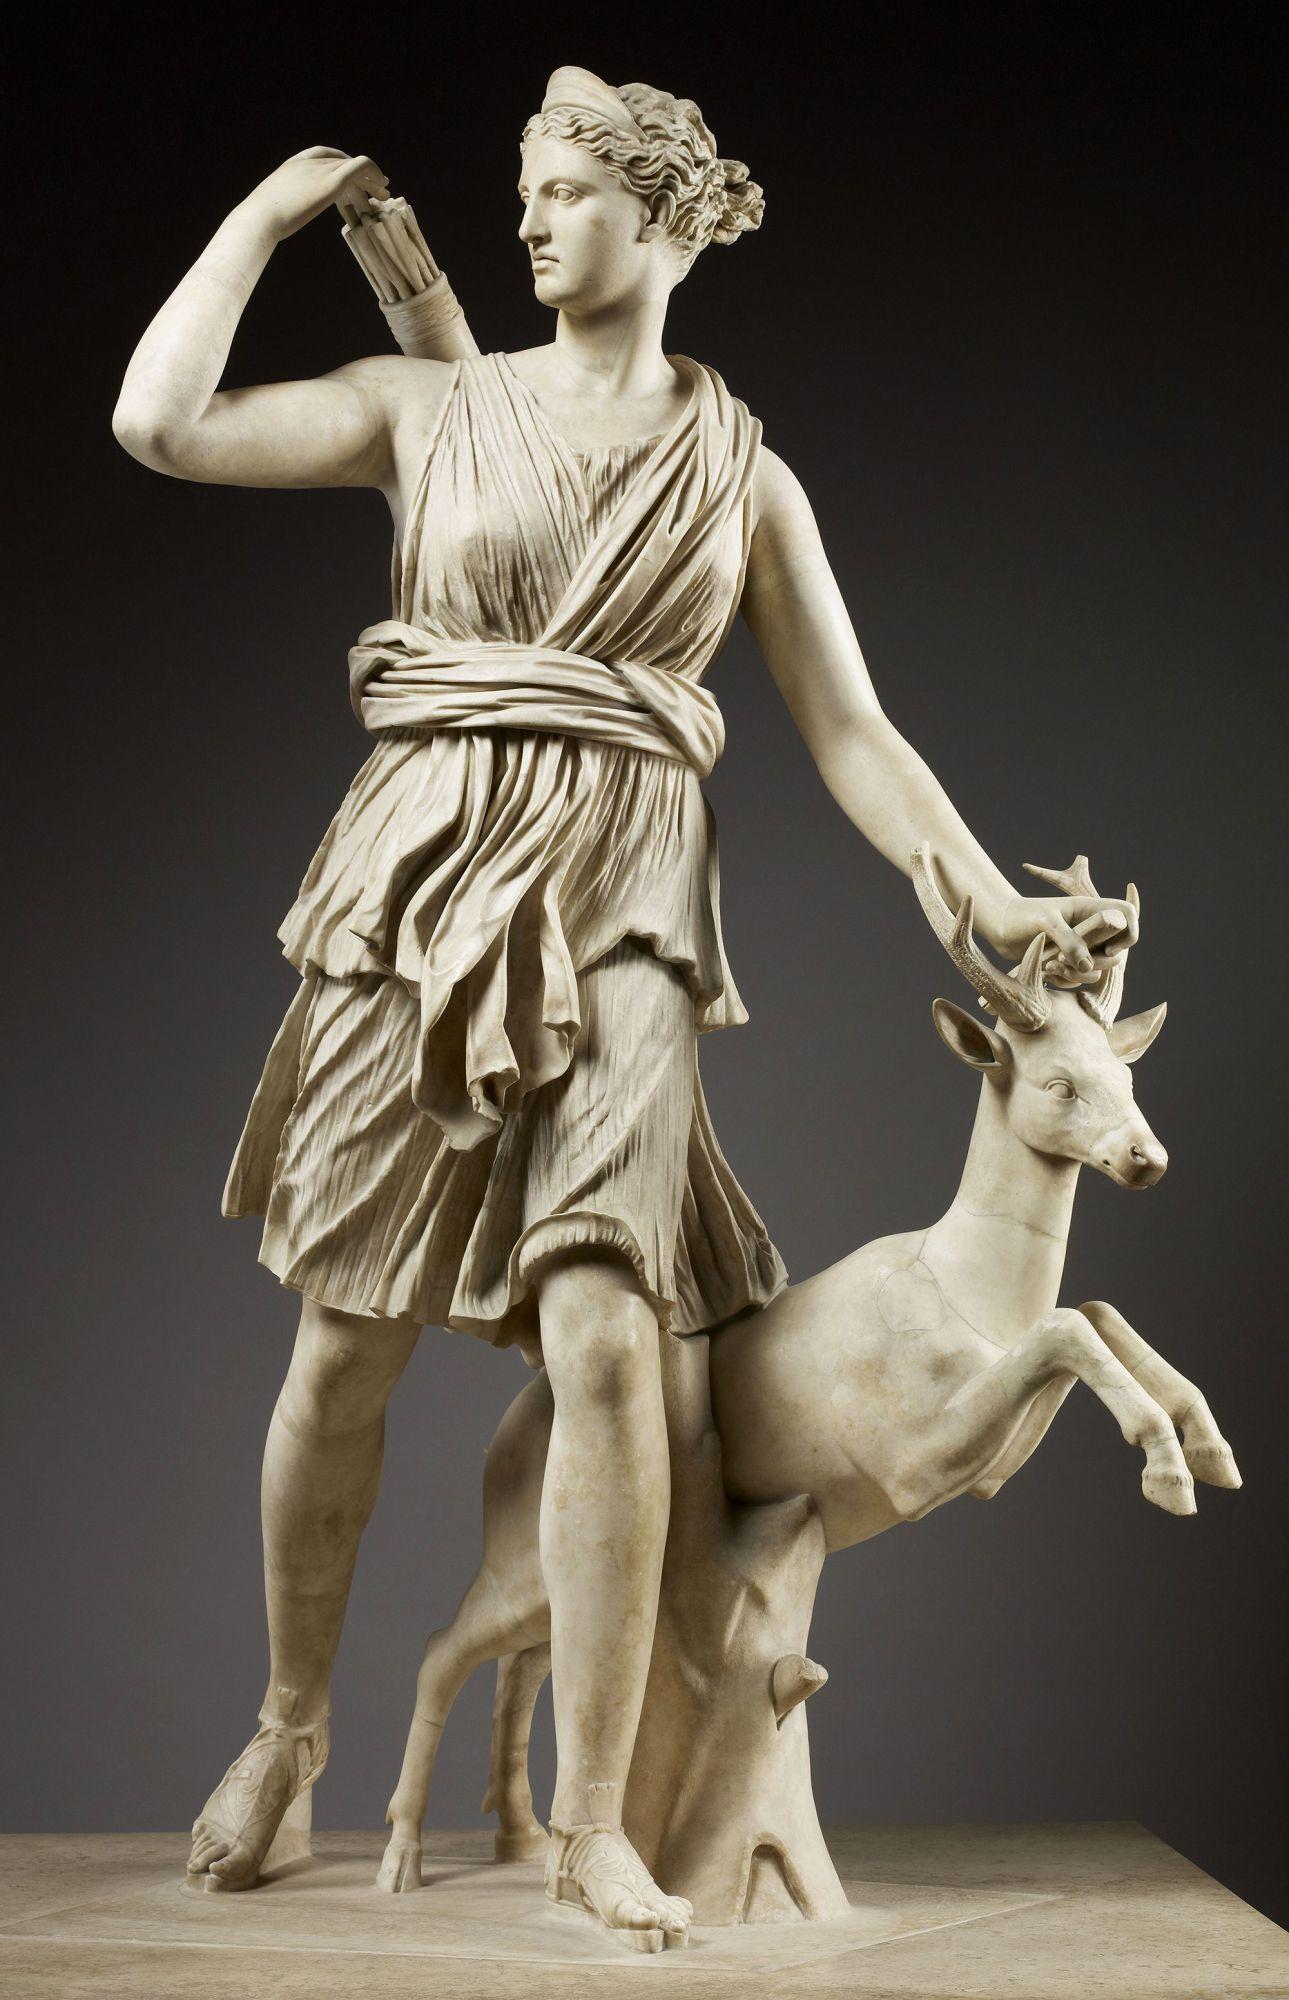 diane-artemis-versailles-mythologie-histoire-attribut